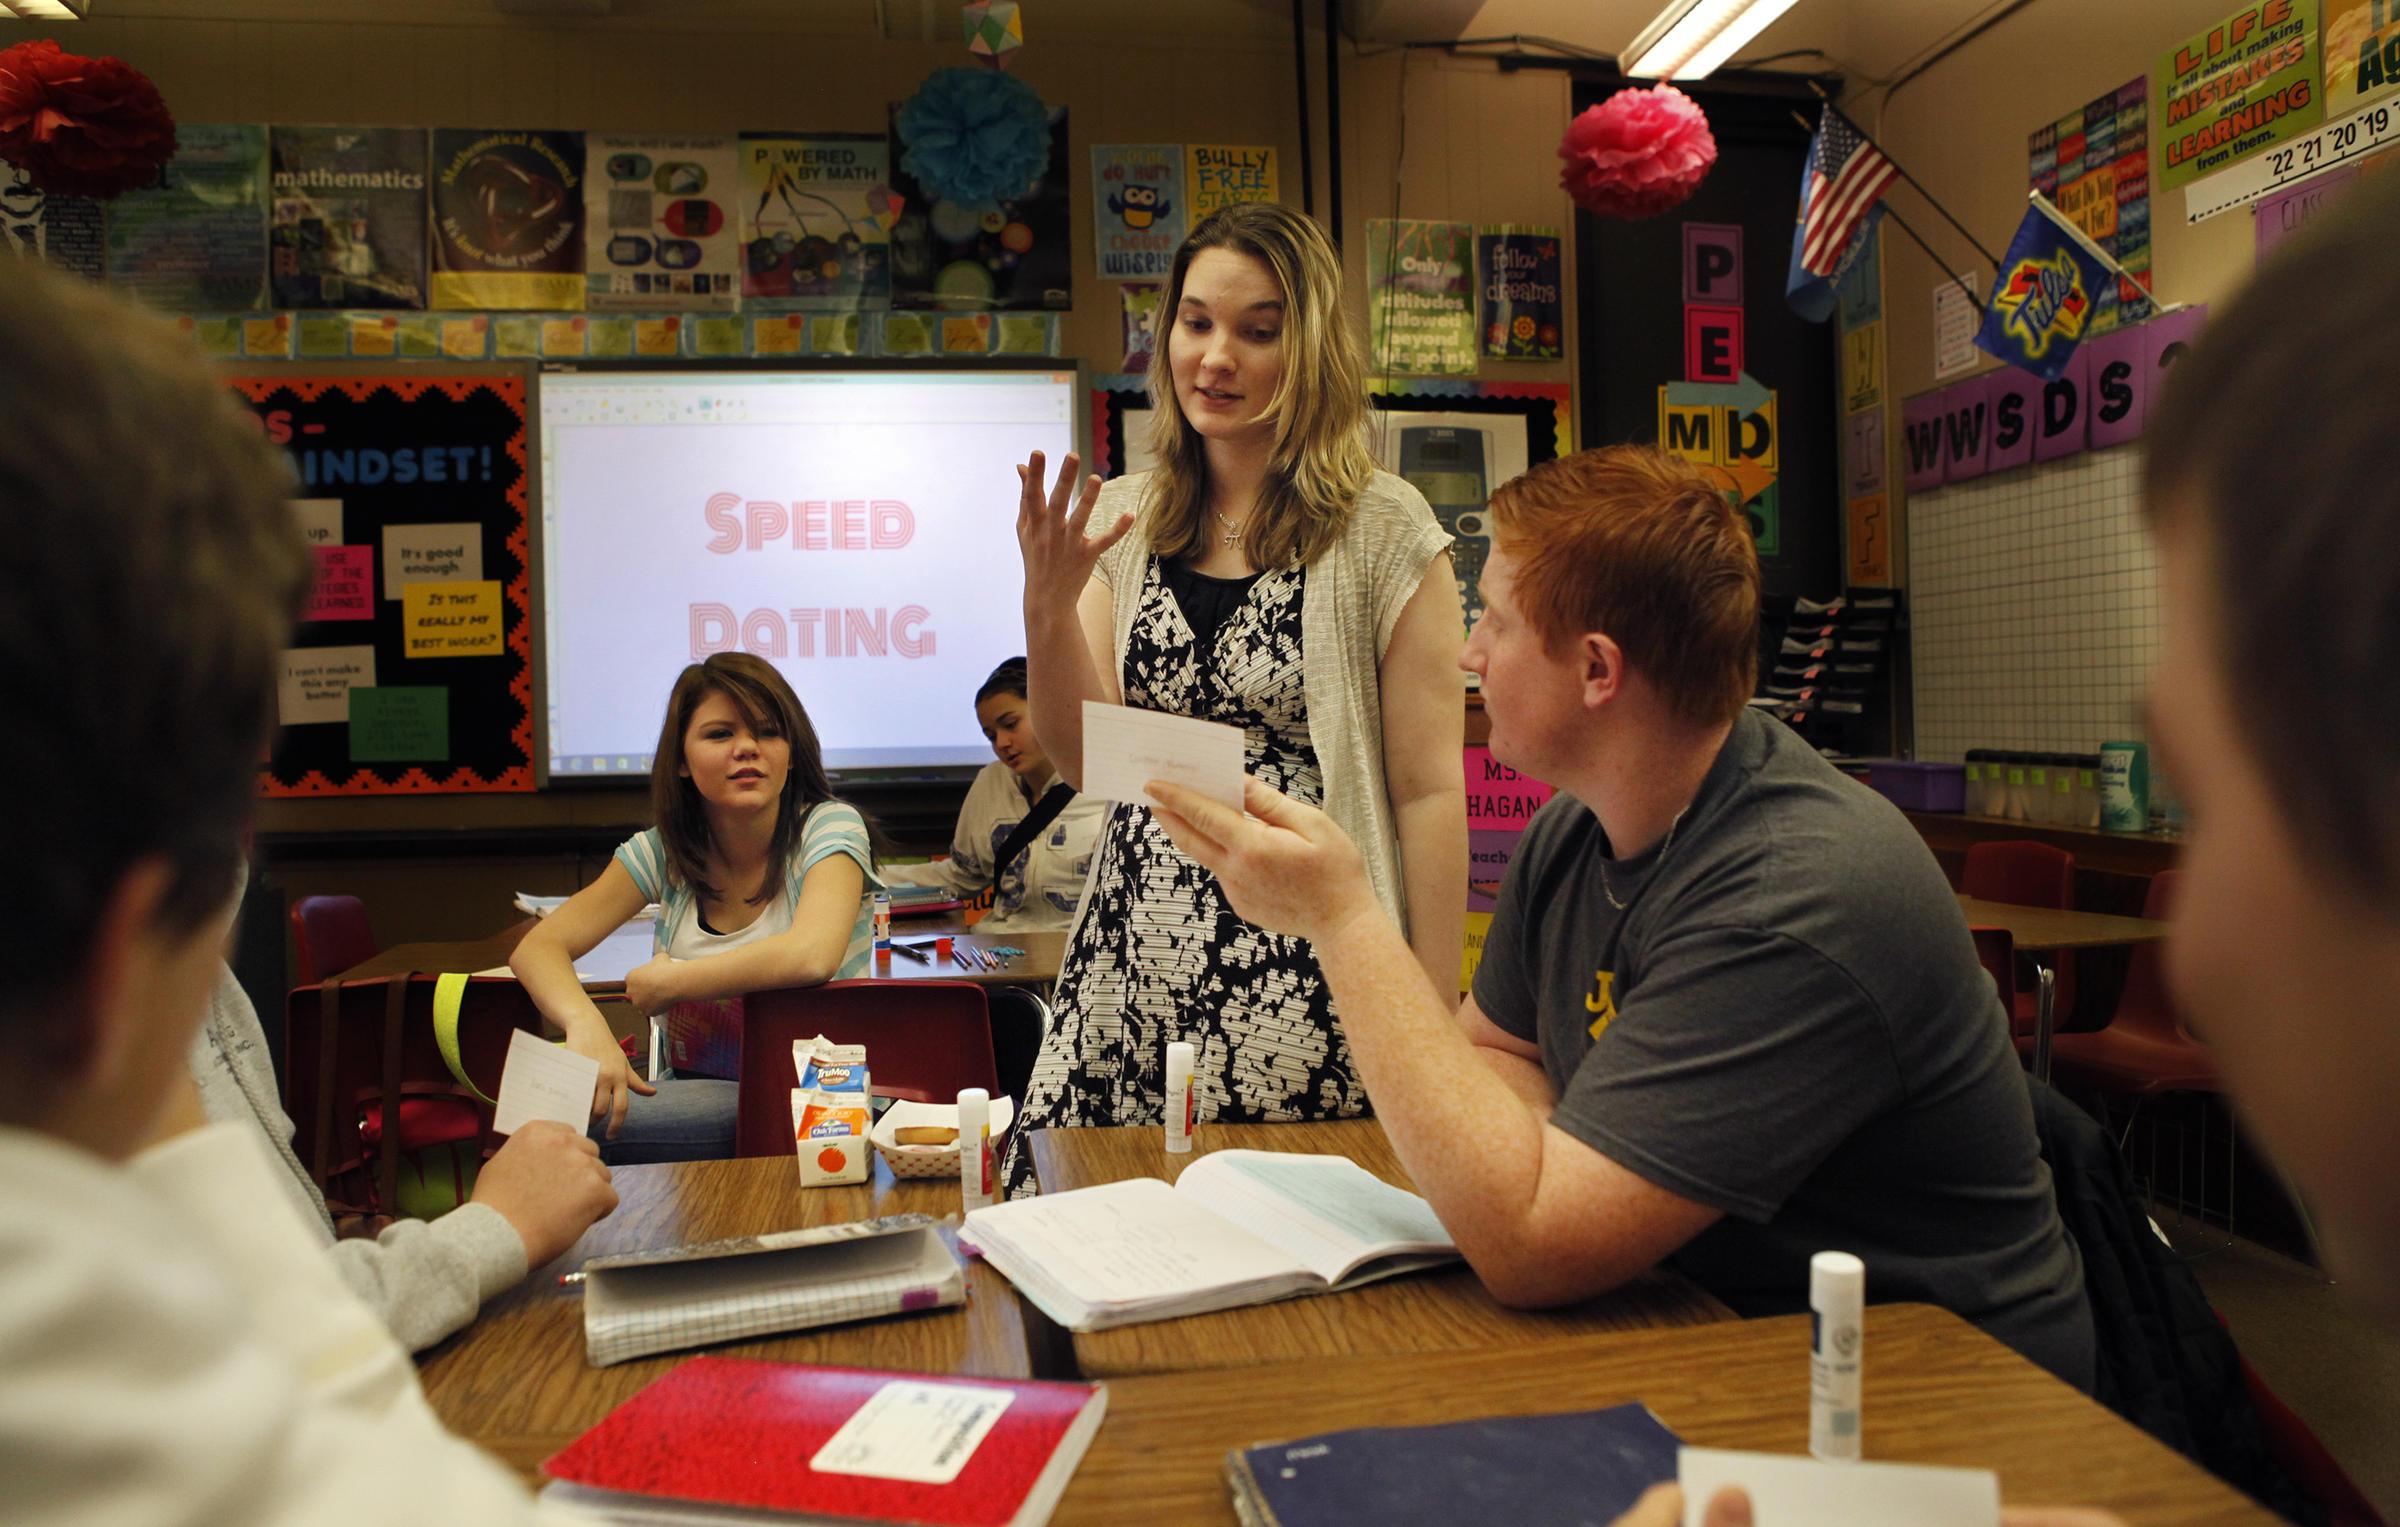 speed dating math classroom